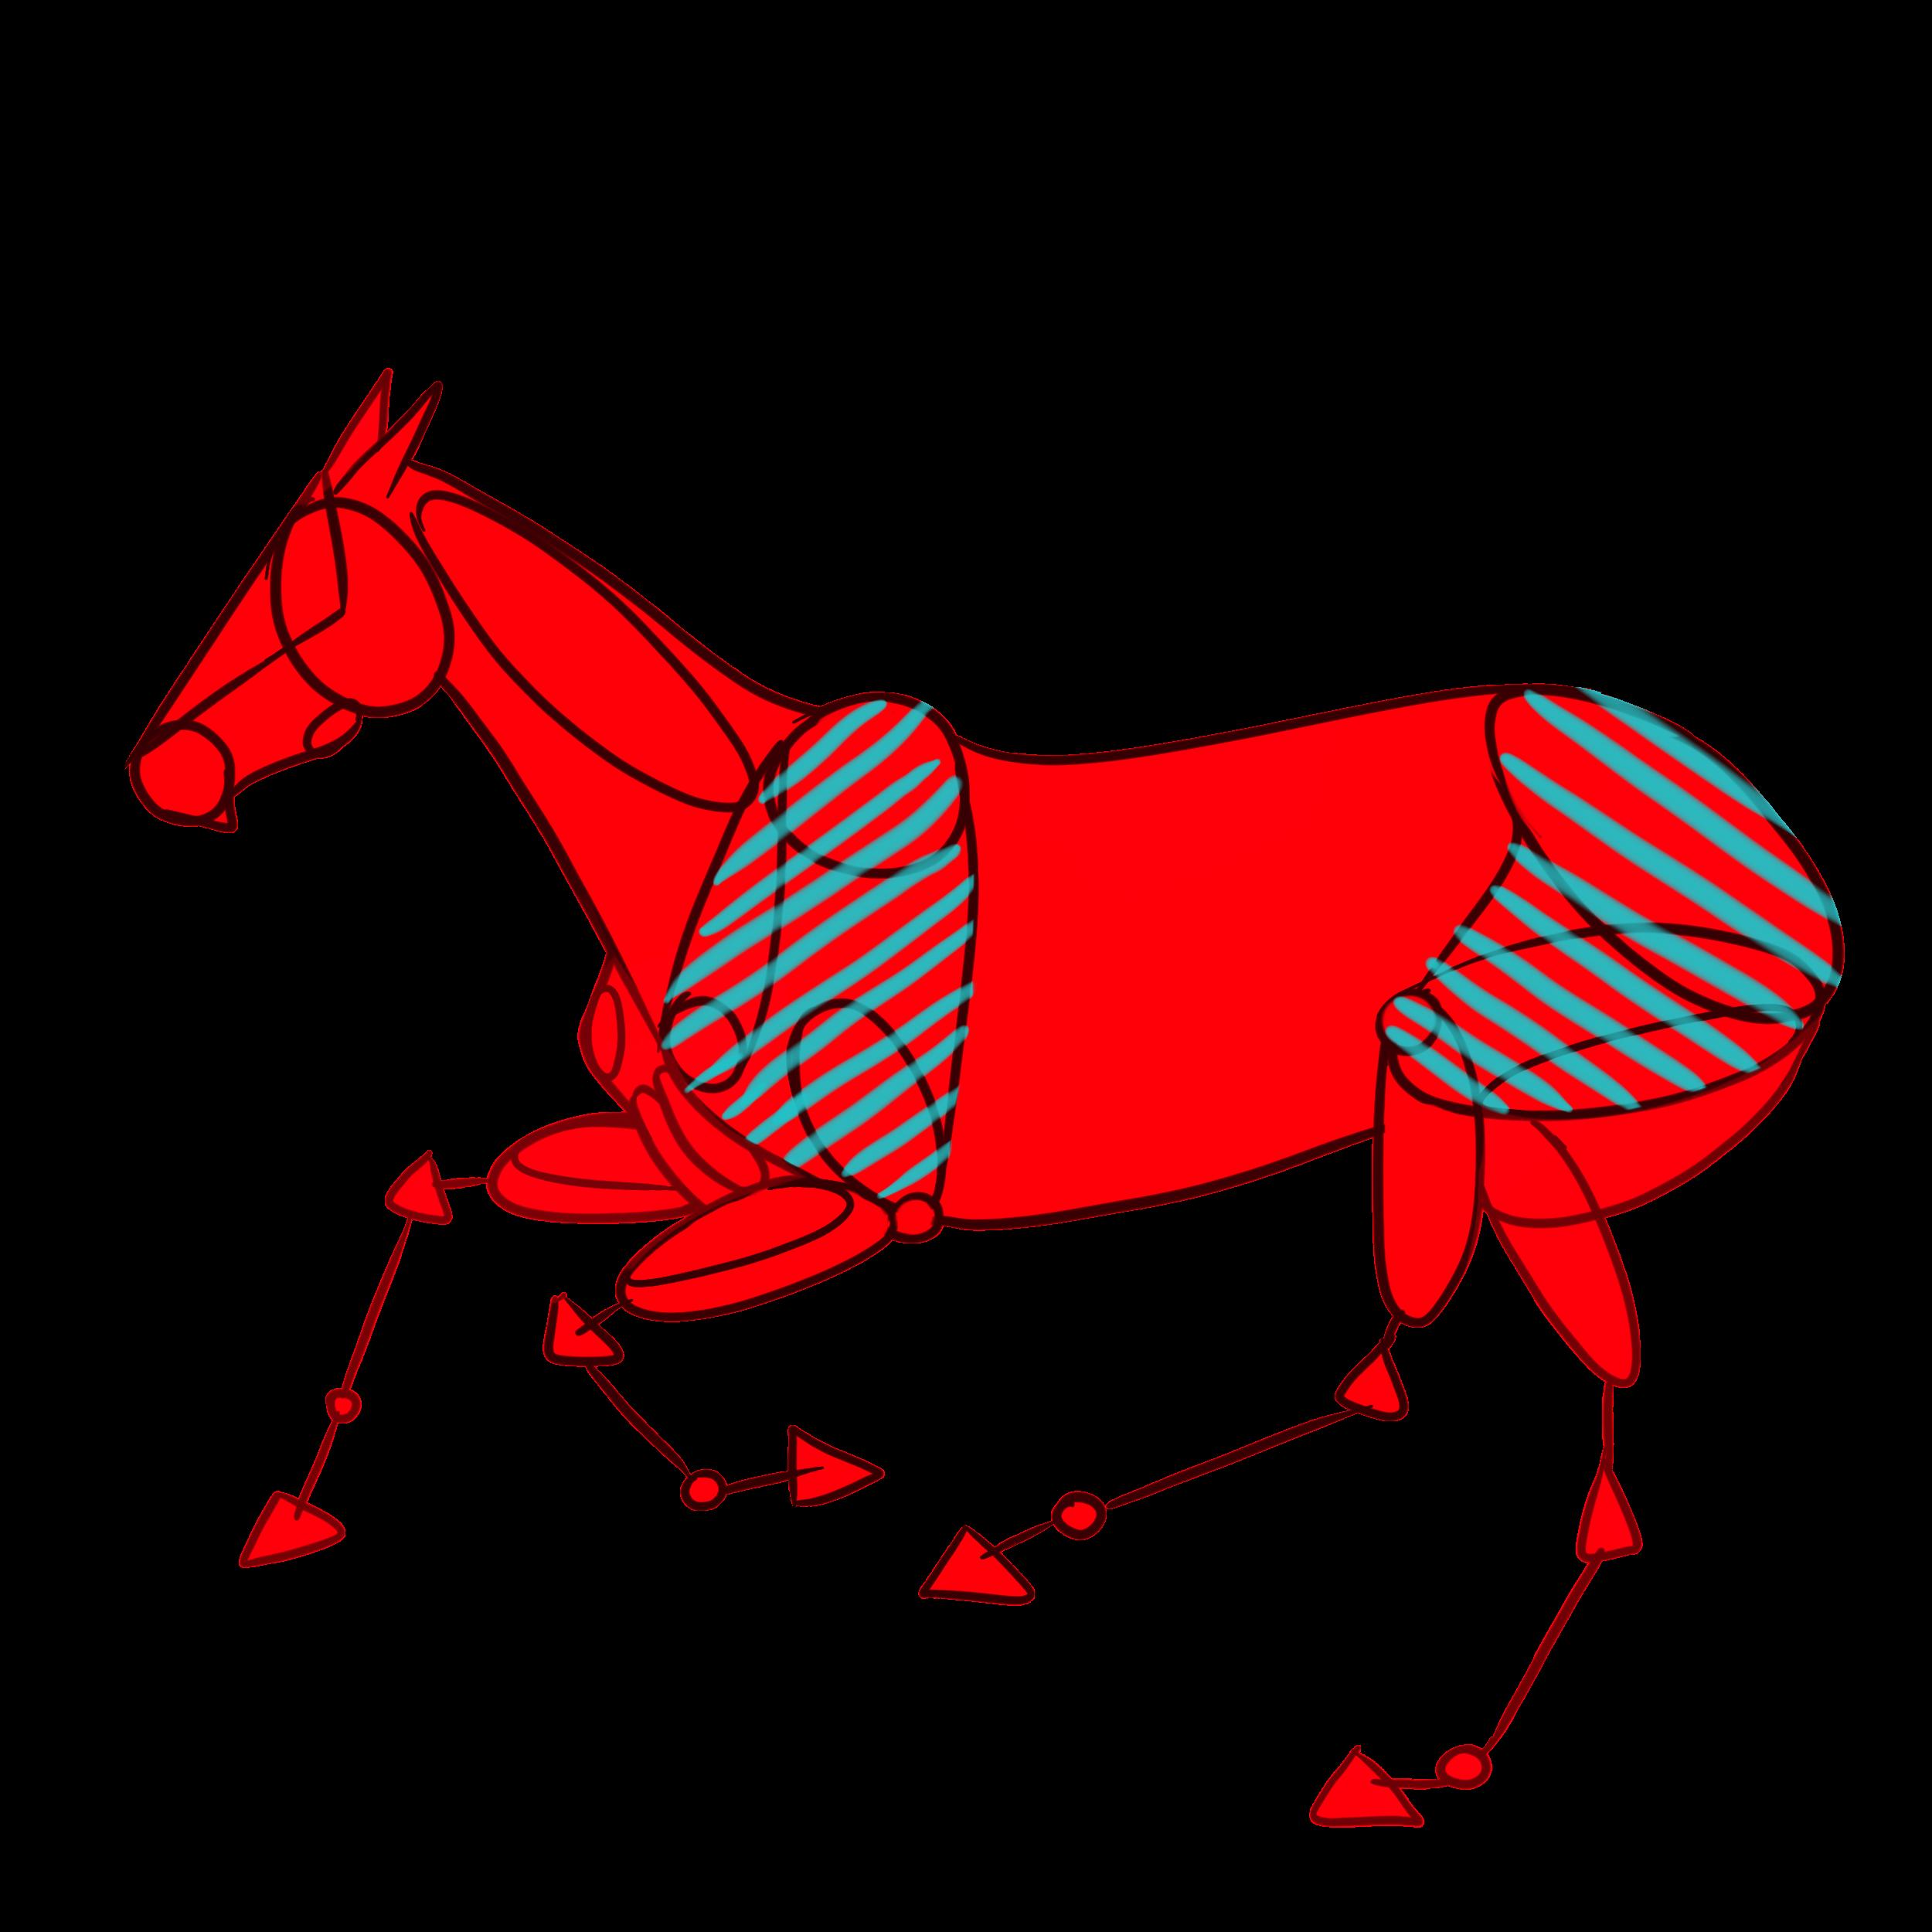 Horse anatomy in figures by konikfryzyjski.deviantart.com on ...